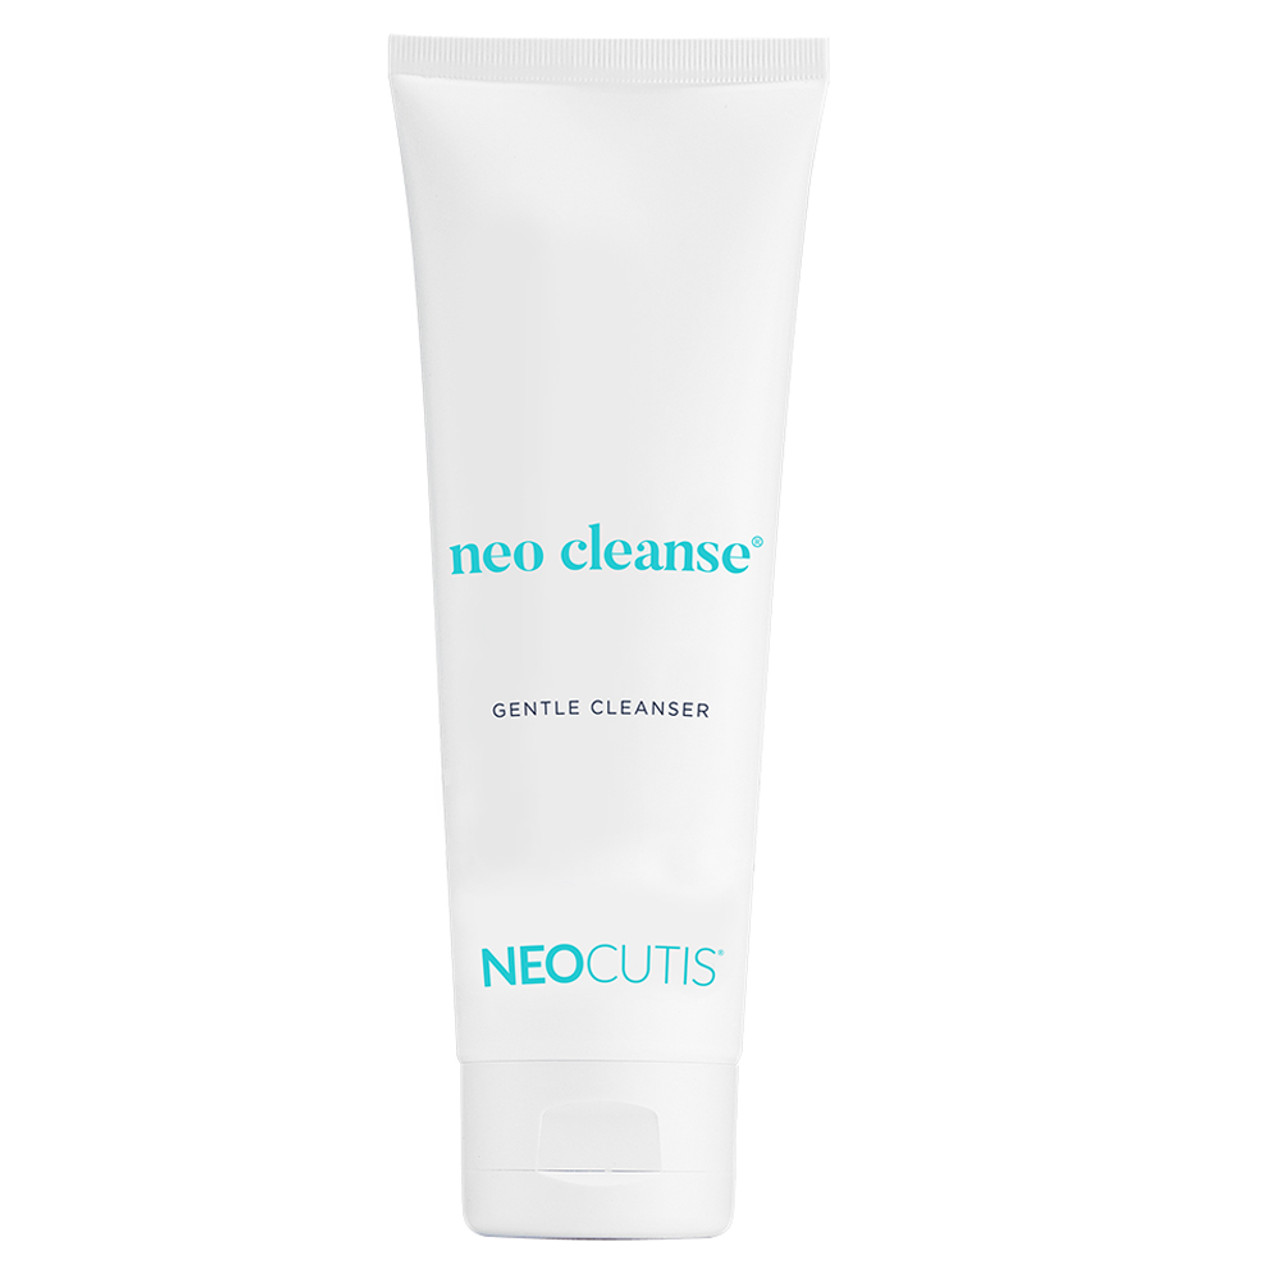 Neocutis NEO-CLEANSE Gentle Skin Cleanser